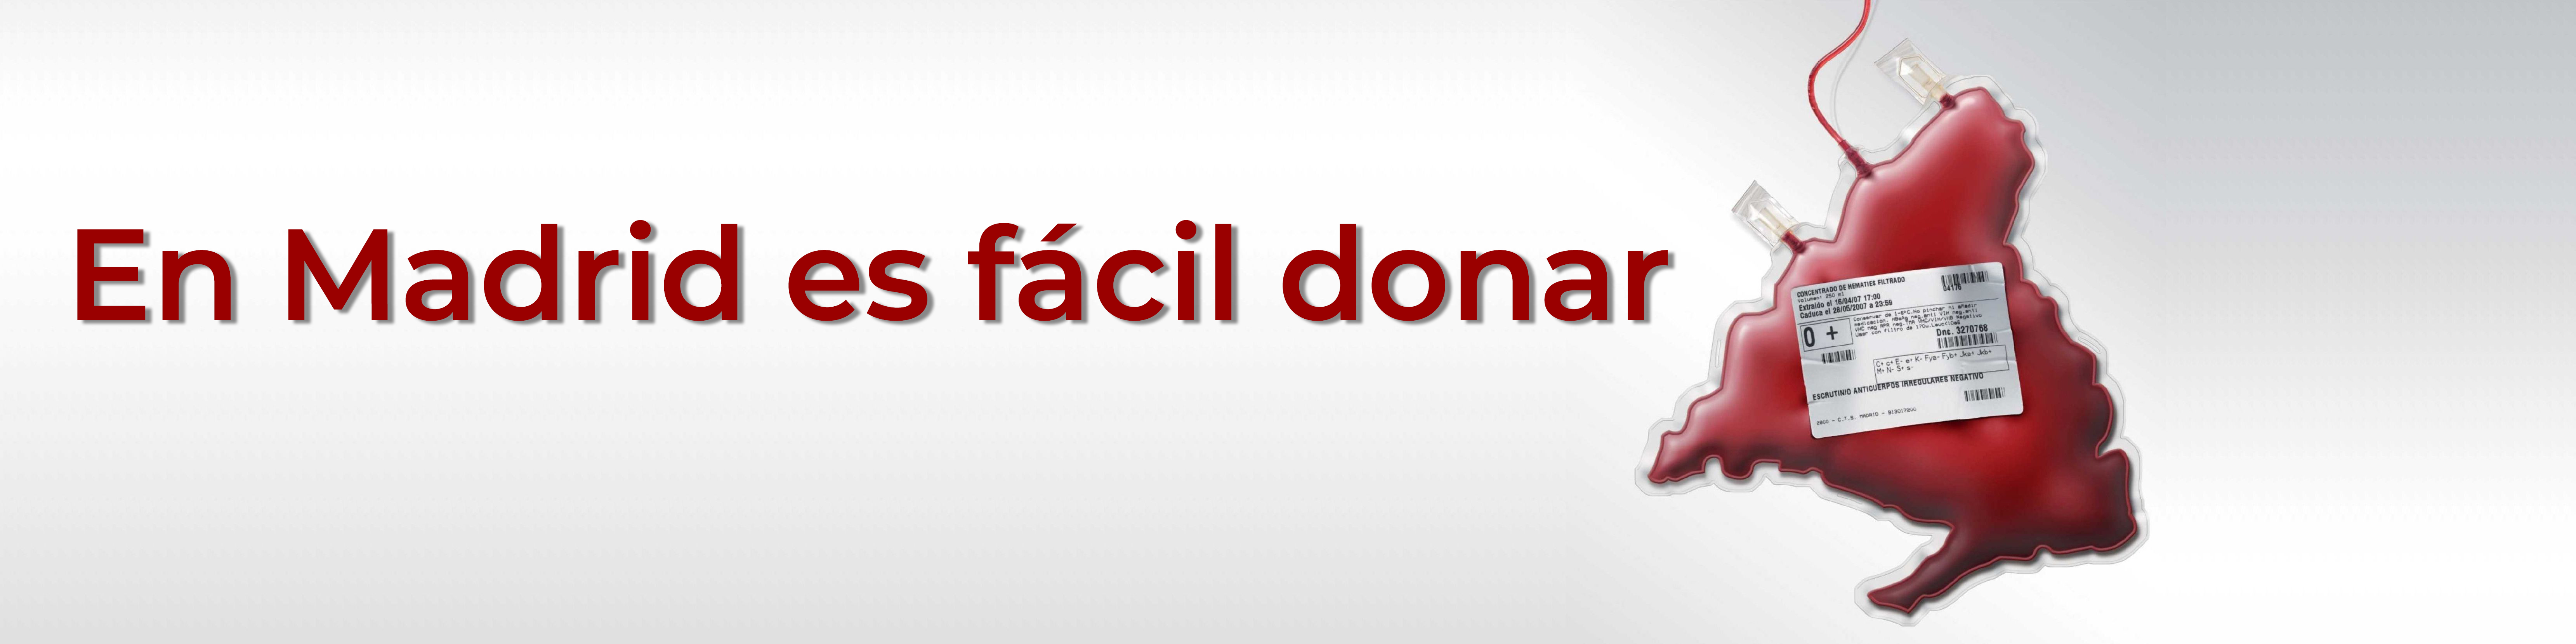 Bolsa de sangre donada